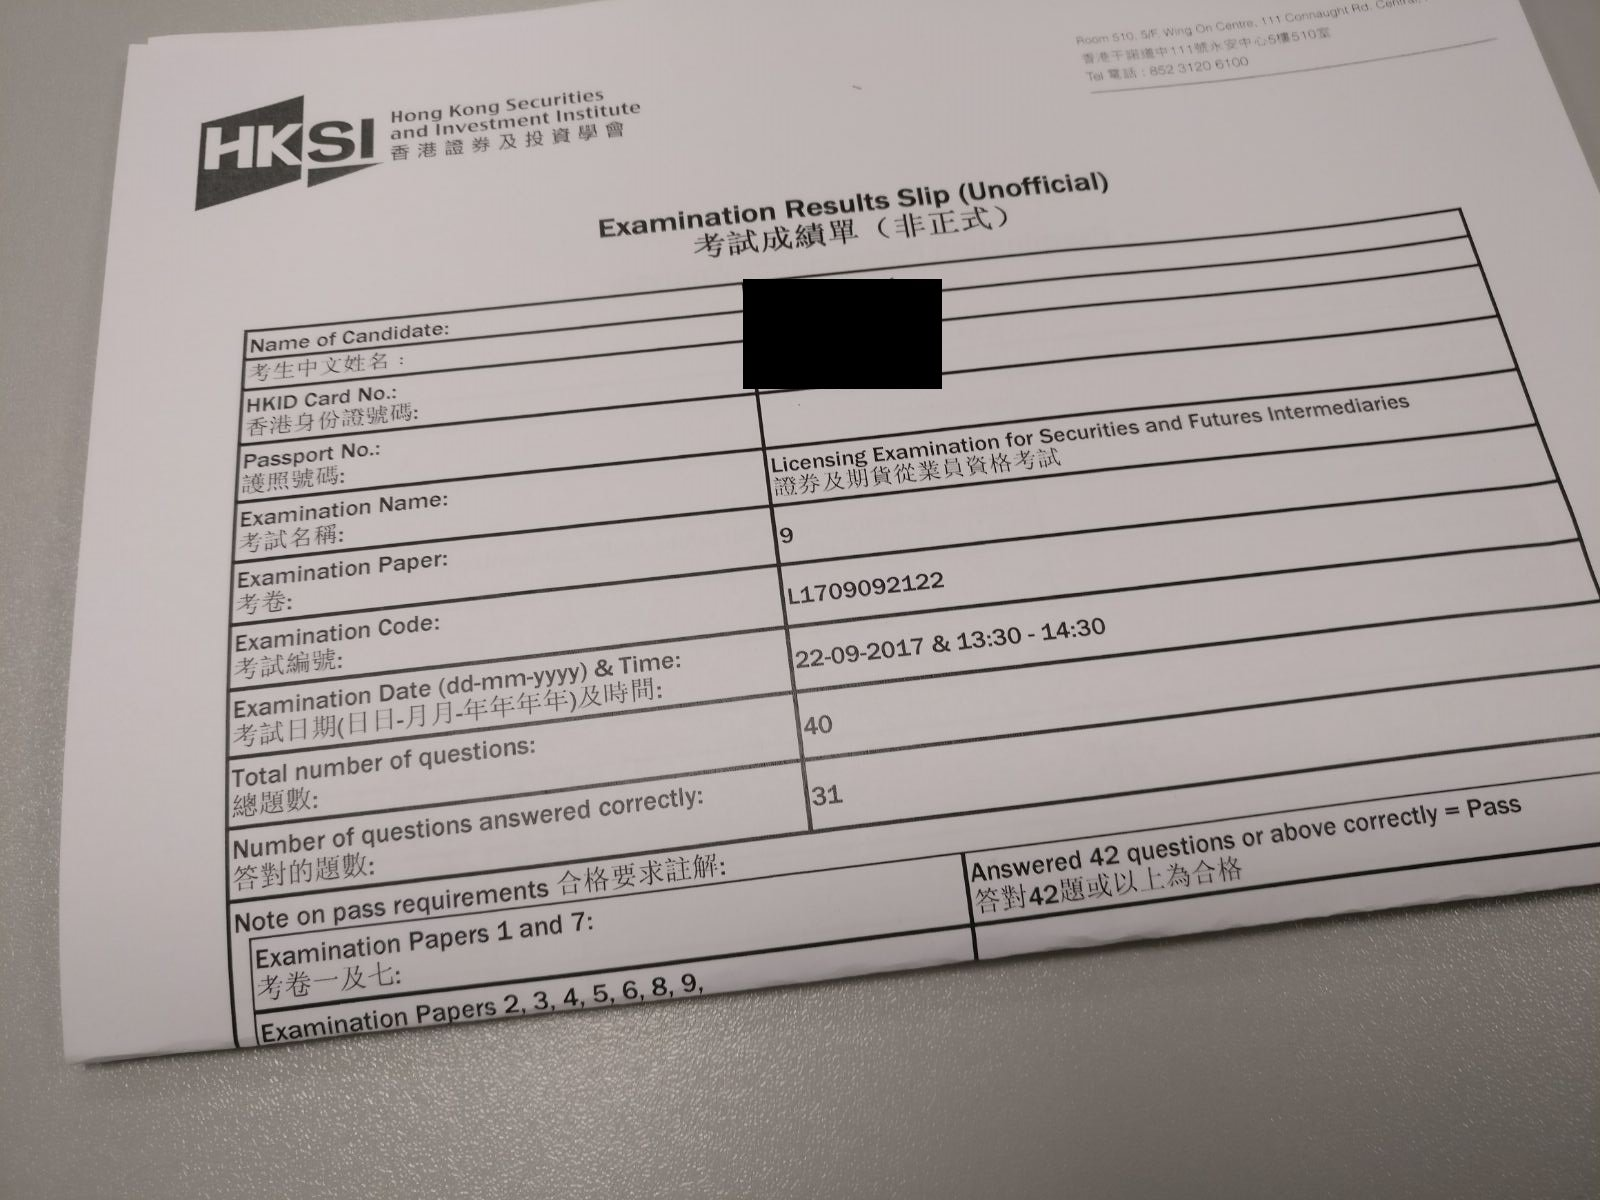 SLC 22/9/2017 LE Paper 9 證券期貨從業員資格考試卷九 Pass